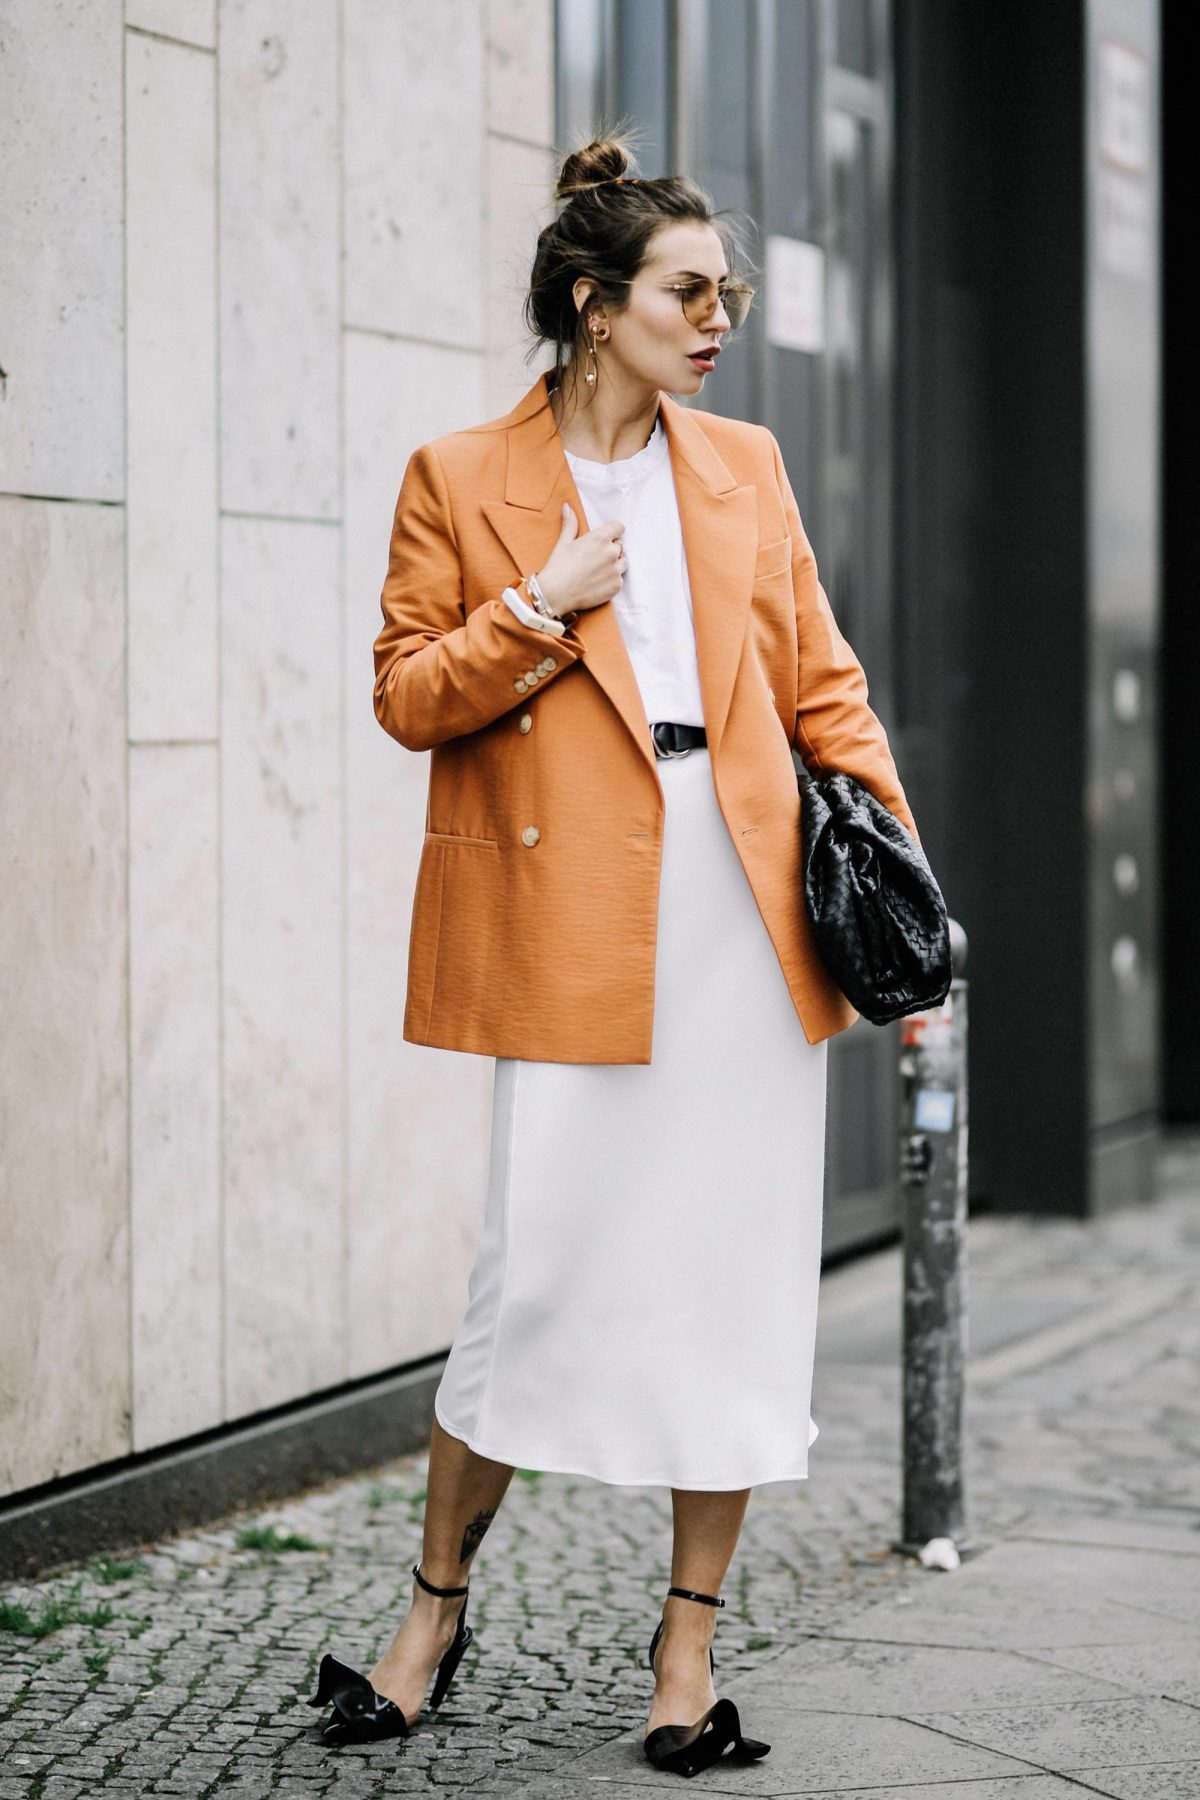 The Orange Blazer